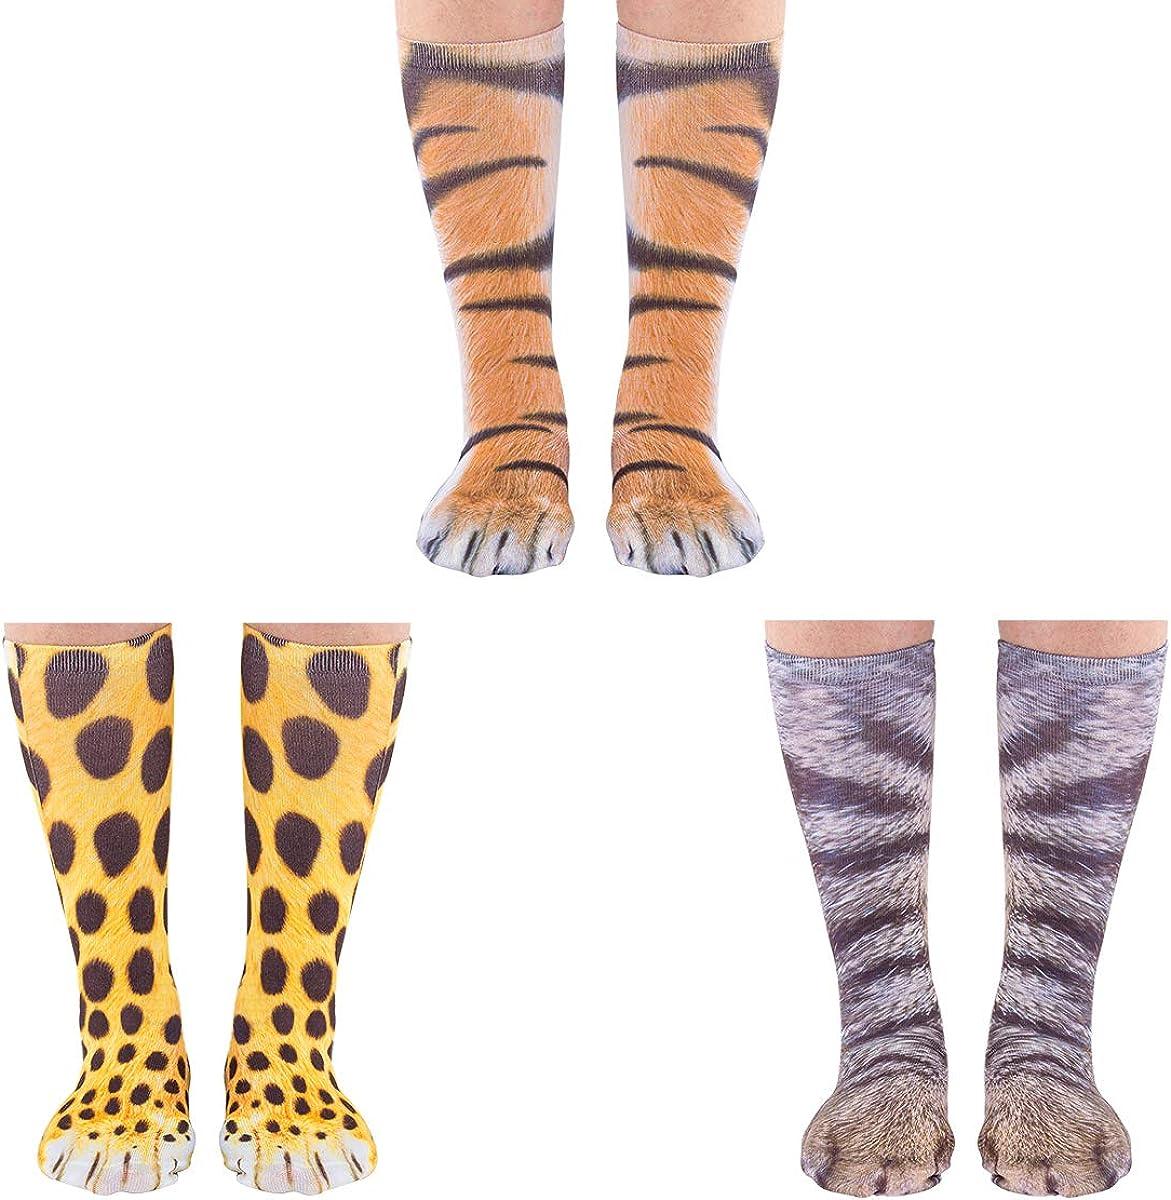 3D Socks Funny Unisex Adult Elastic Sock Cute Animal Cat Print Foot Socks Pair